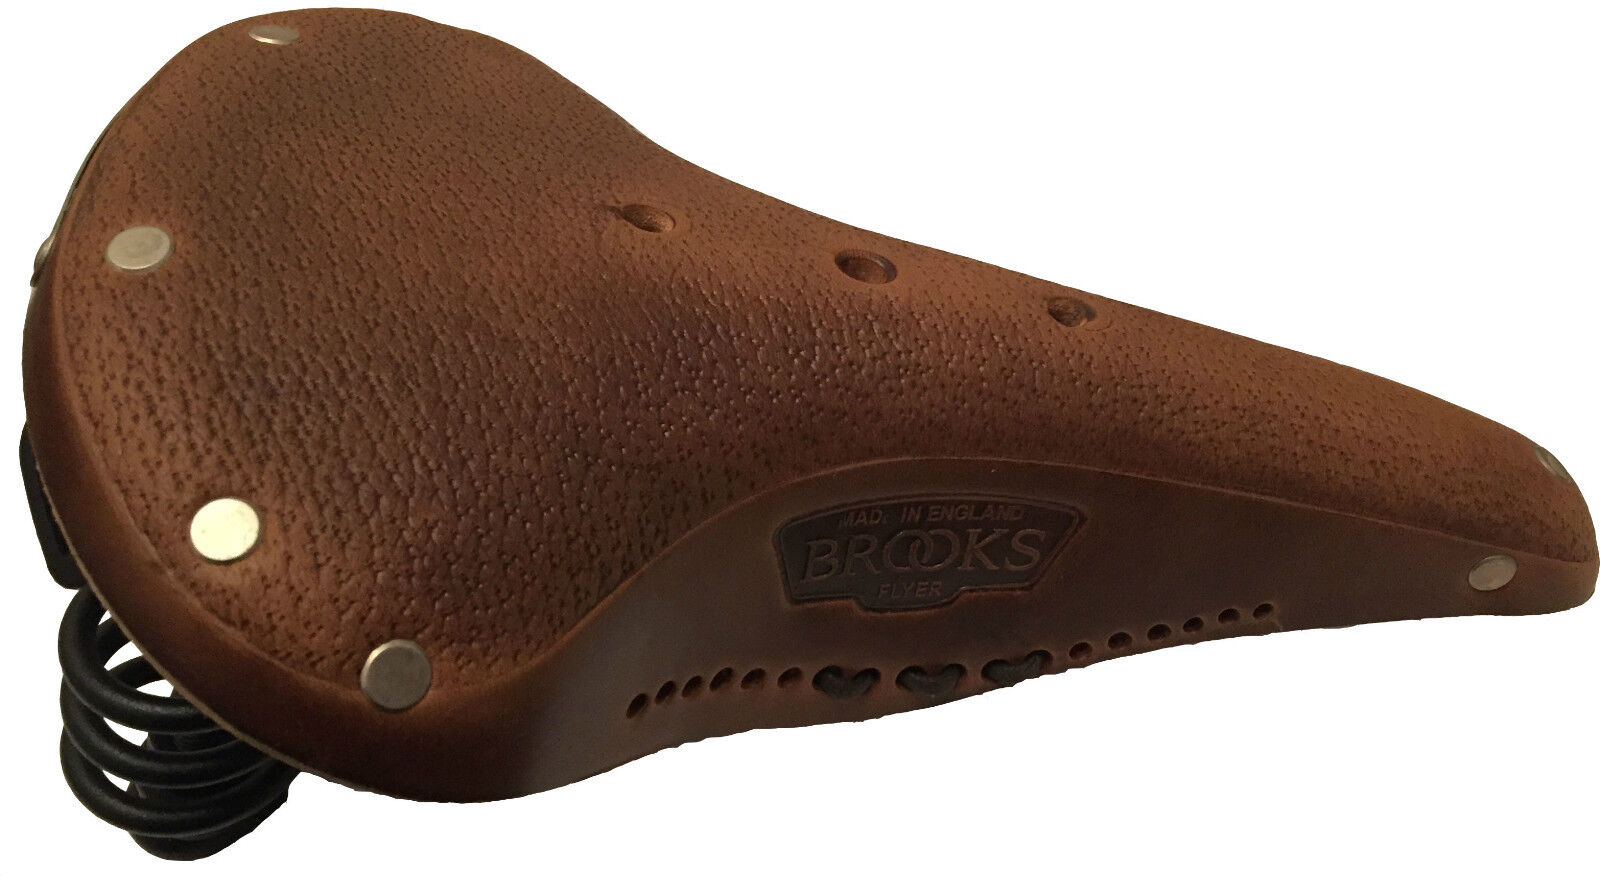 Brooks Flyer Uomo b396 aged trattato Pelle Sella Trekking Viaggi e MTB